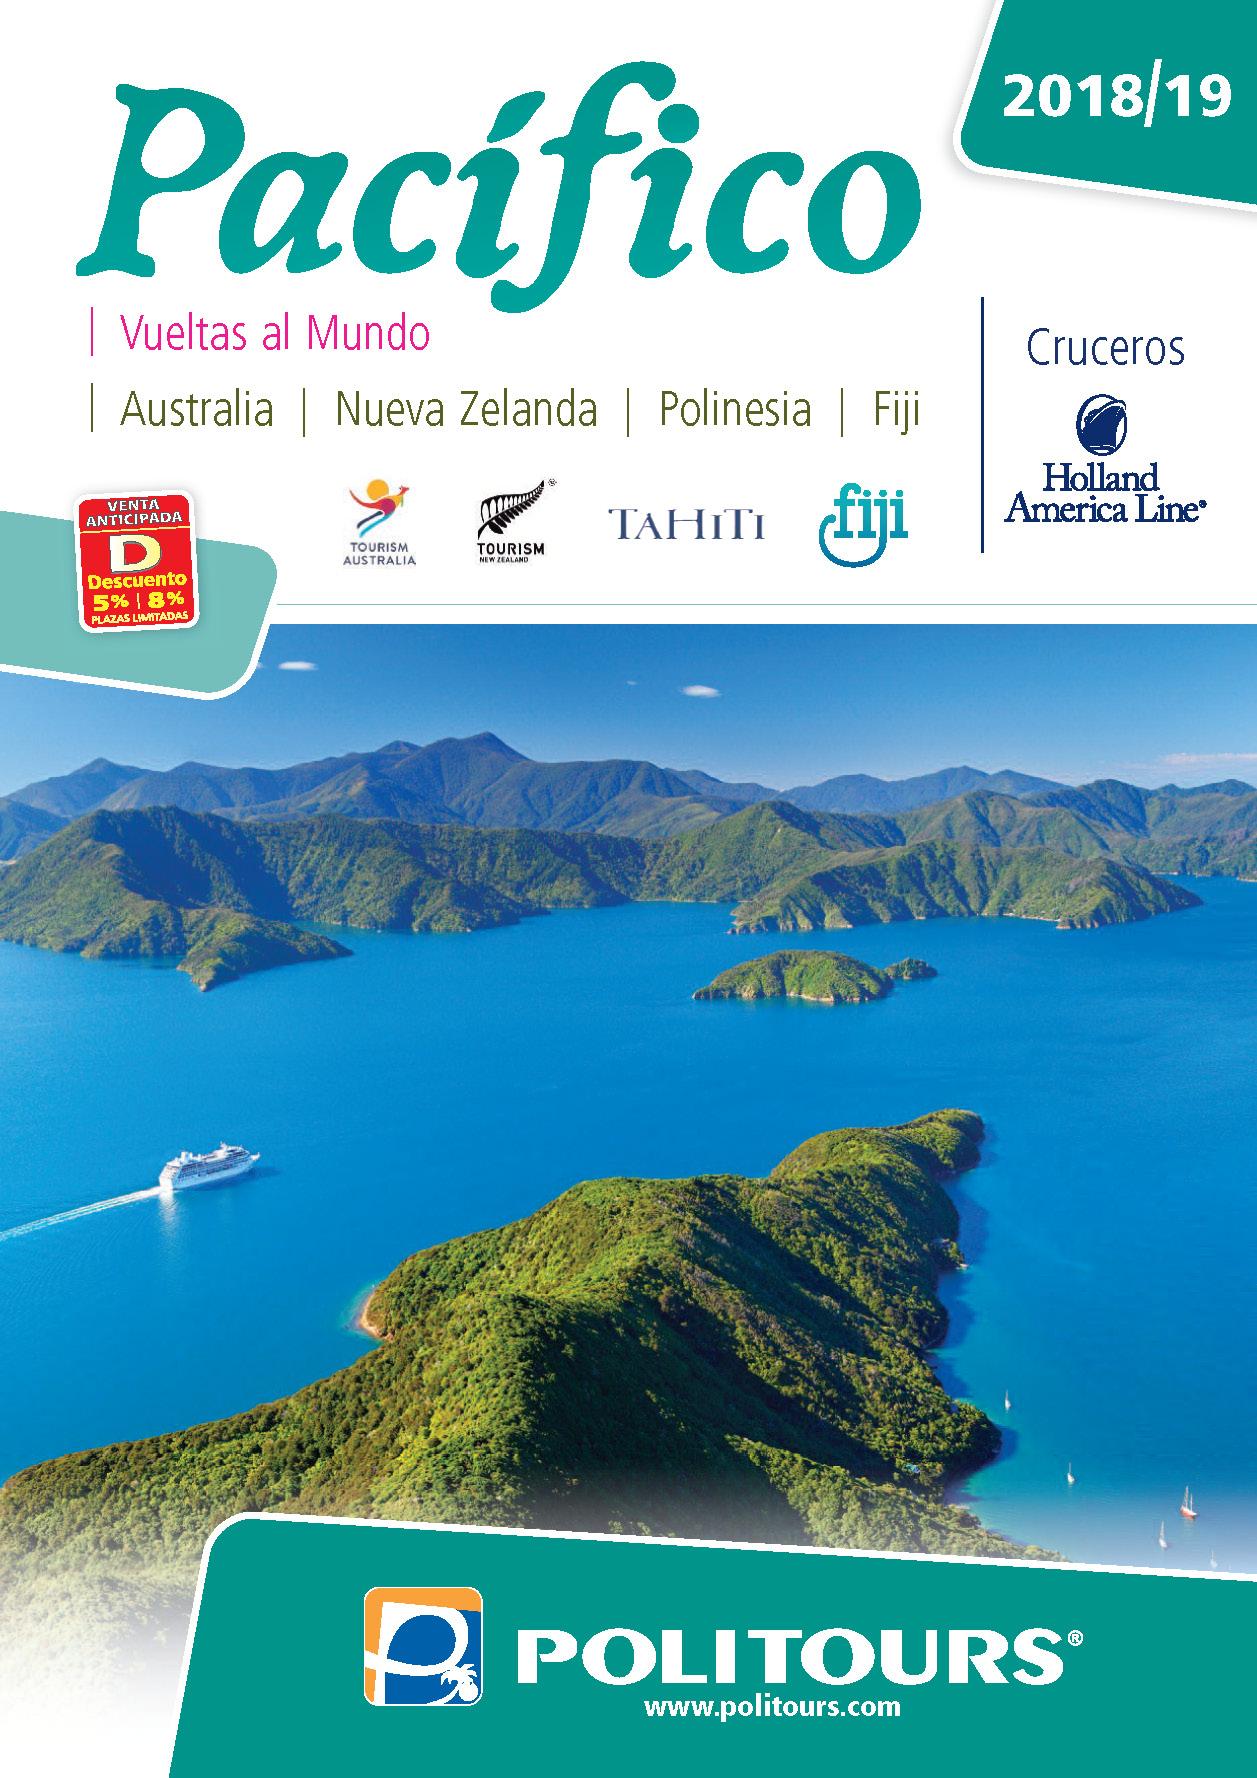 Catalogo Politours Pacifico 2018-2019